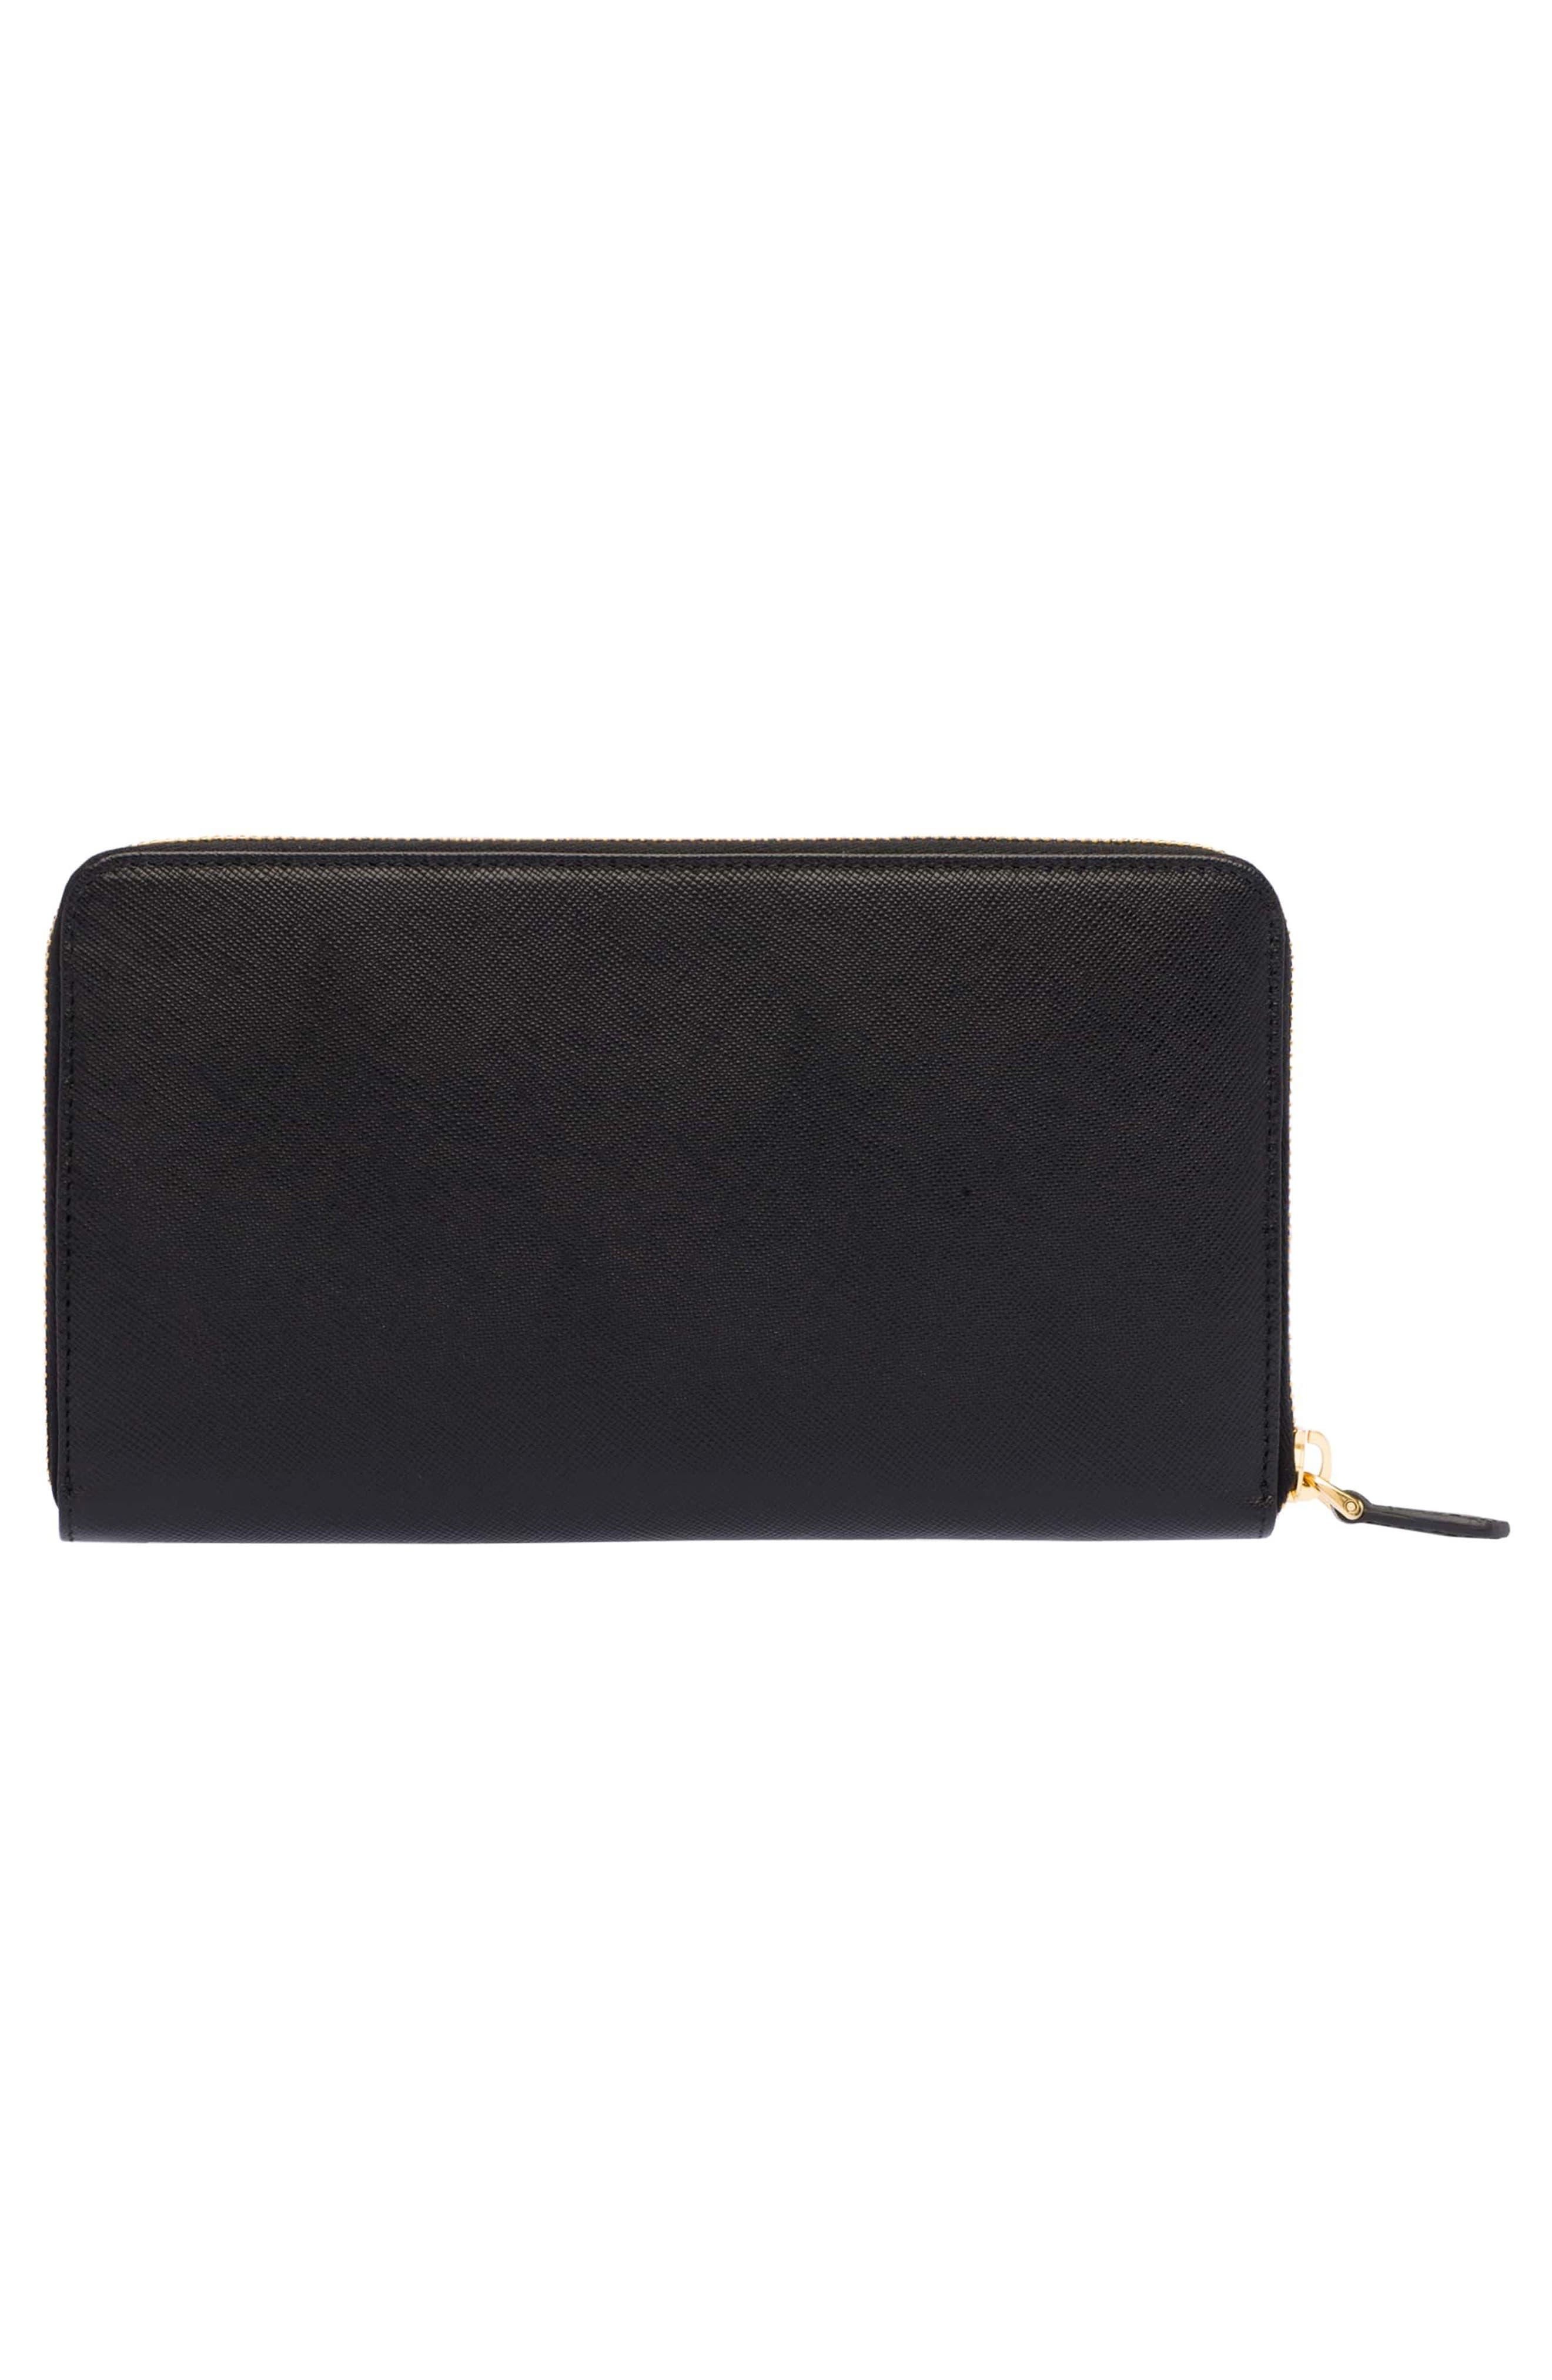 Alternate Image 3  - Prada Oro Saffiano Leather Zip Around Wallet